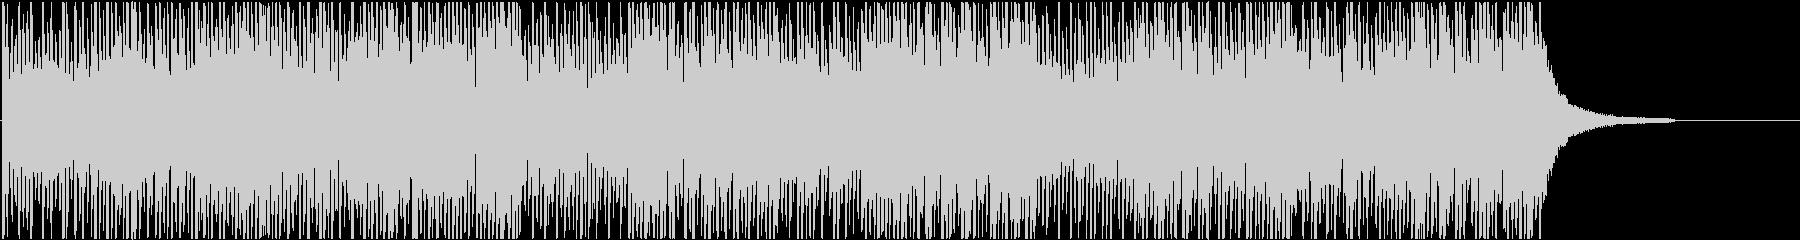 News7 24bit44kHzVerの未再生の波形